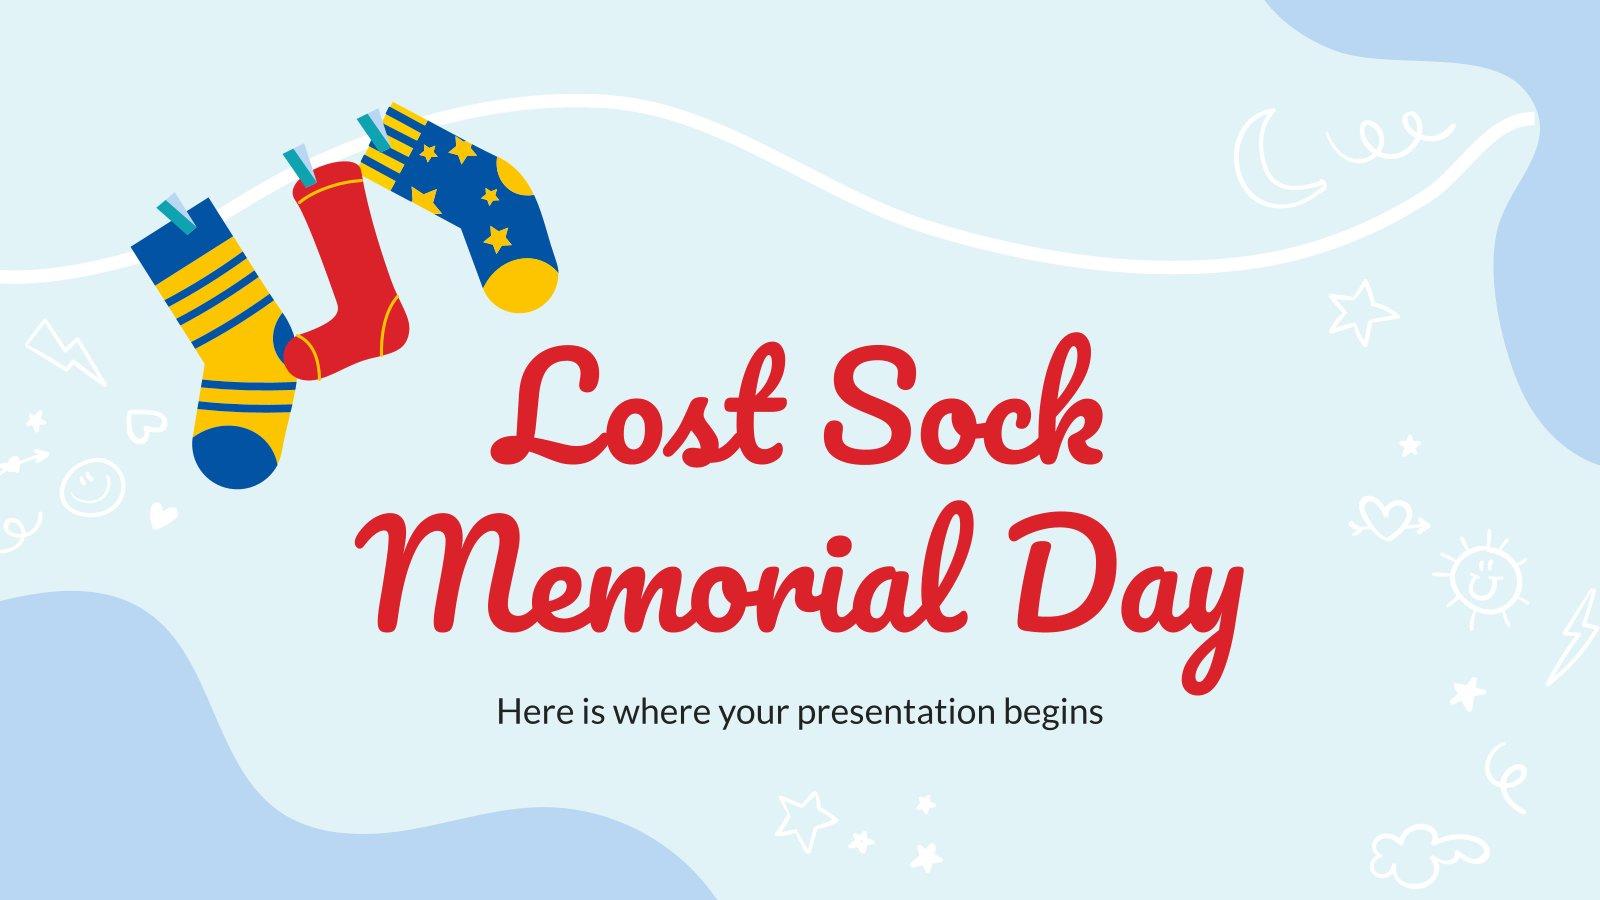 Lost Sock Memorial Day presentation template